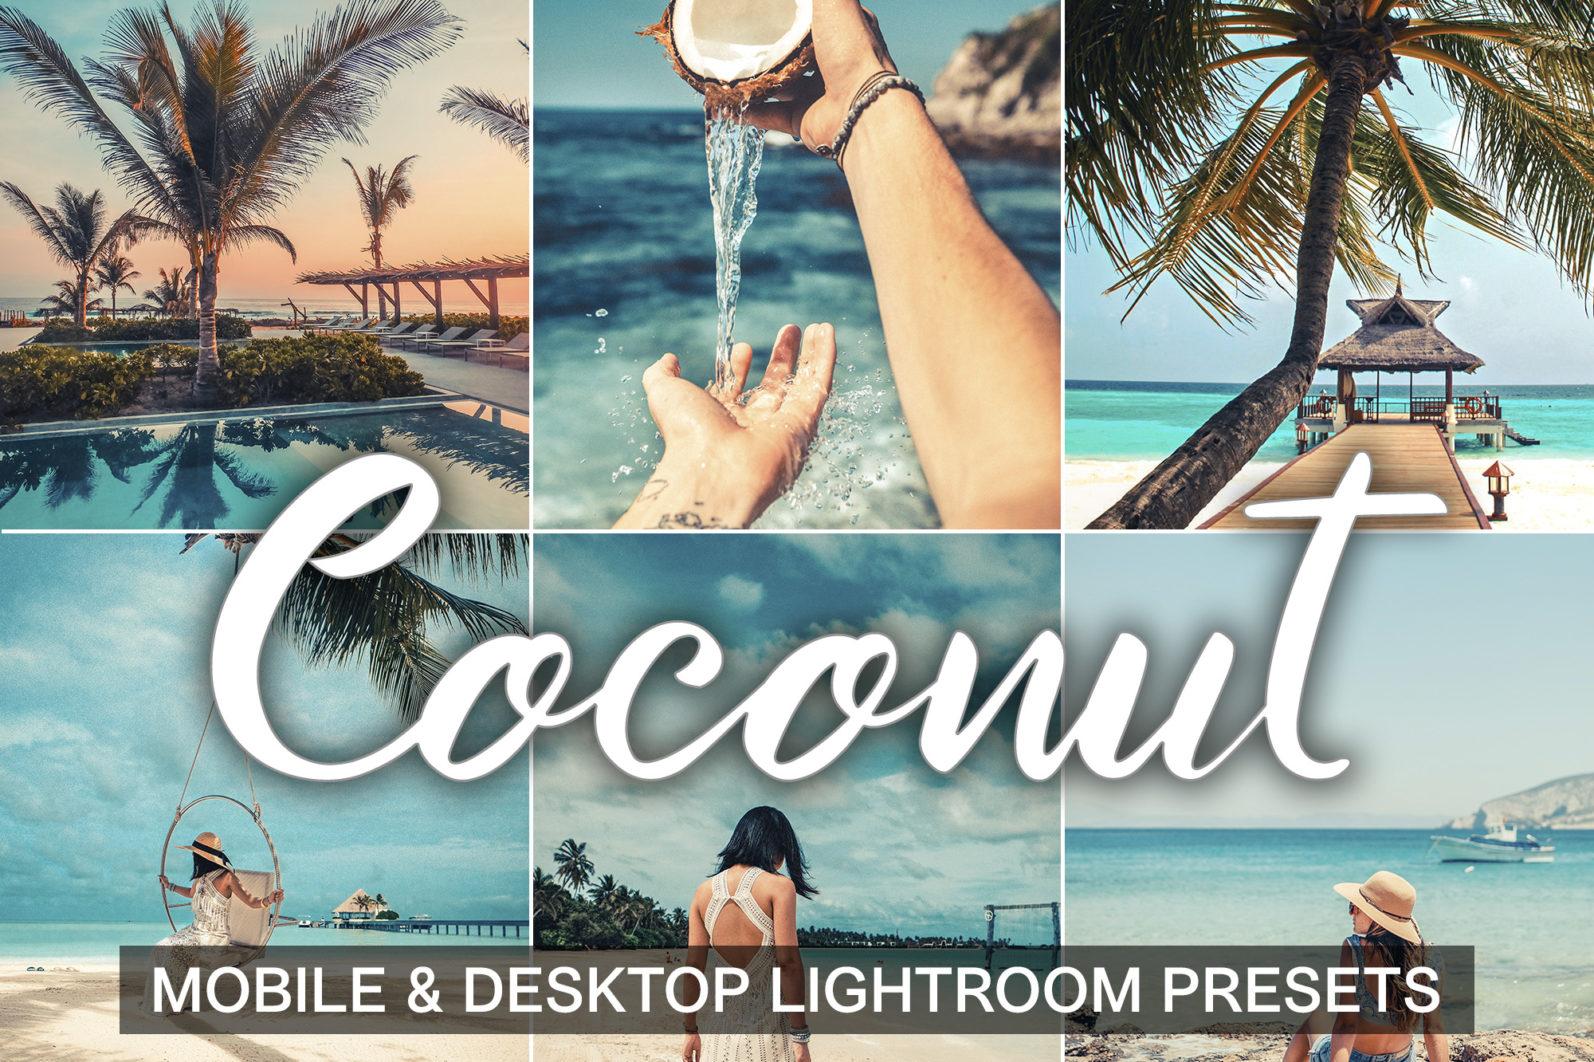 Promotional materials - Coconut presets cover product mobile desktop -